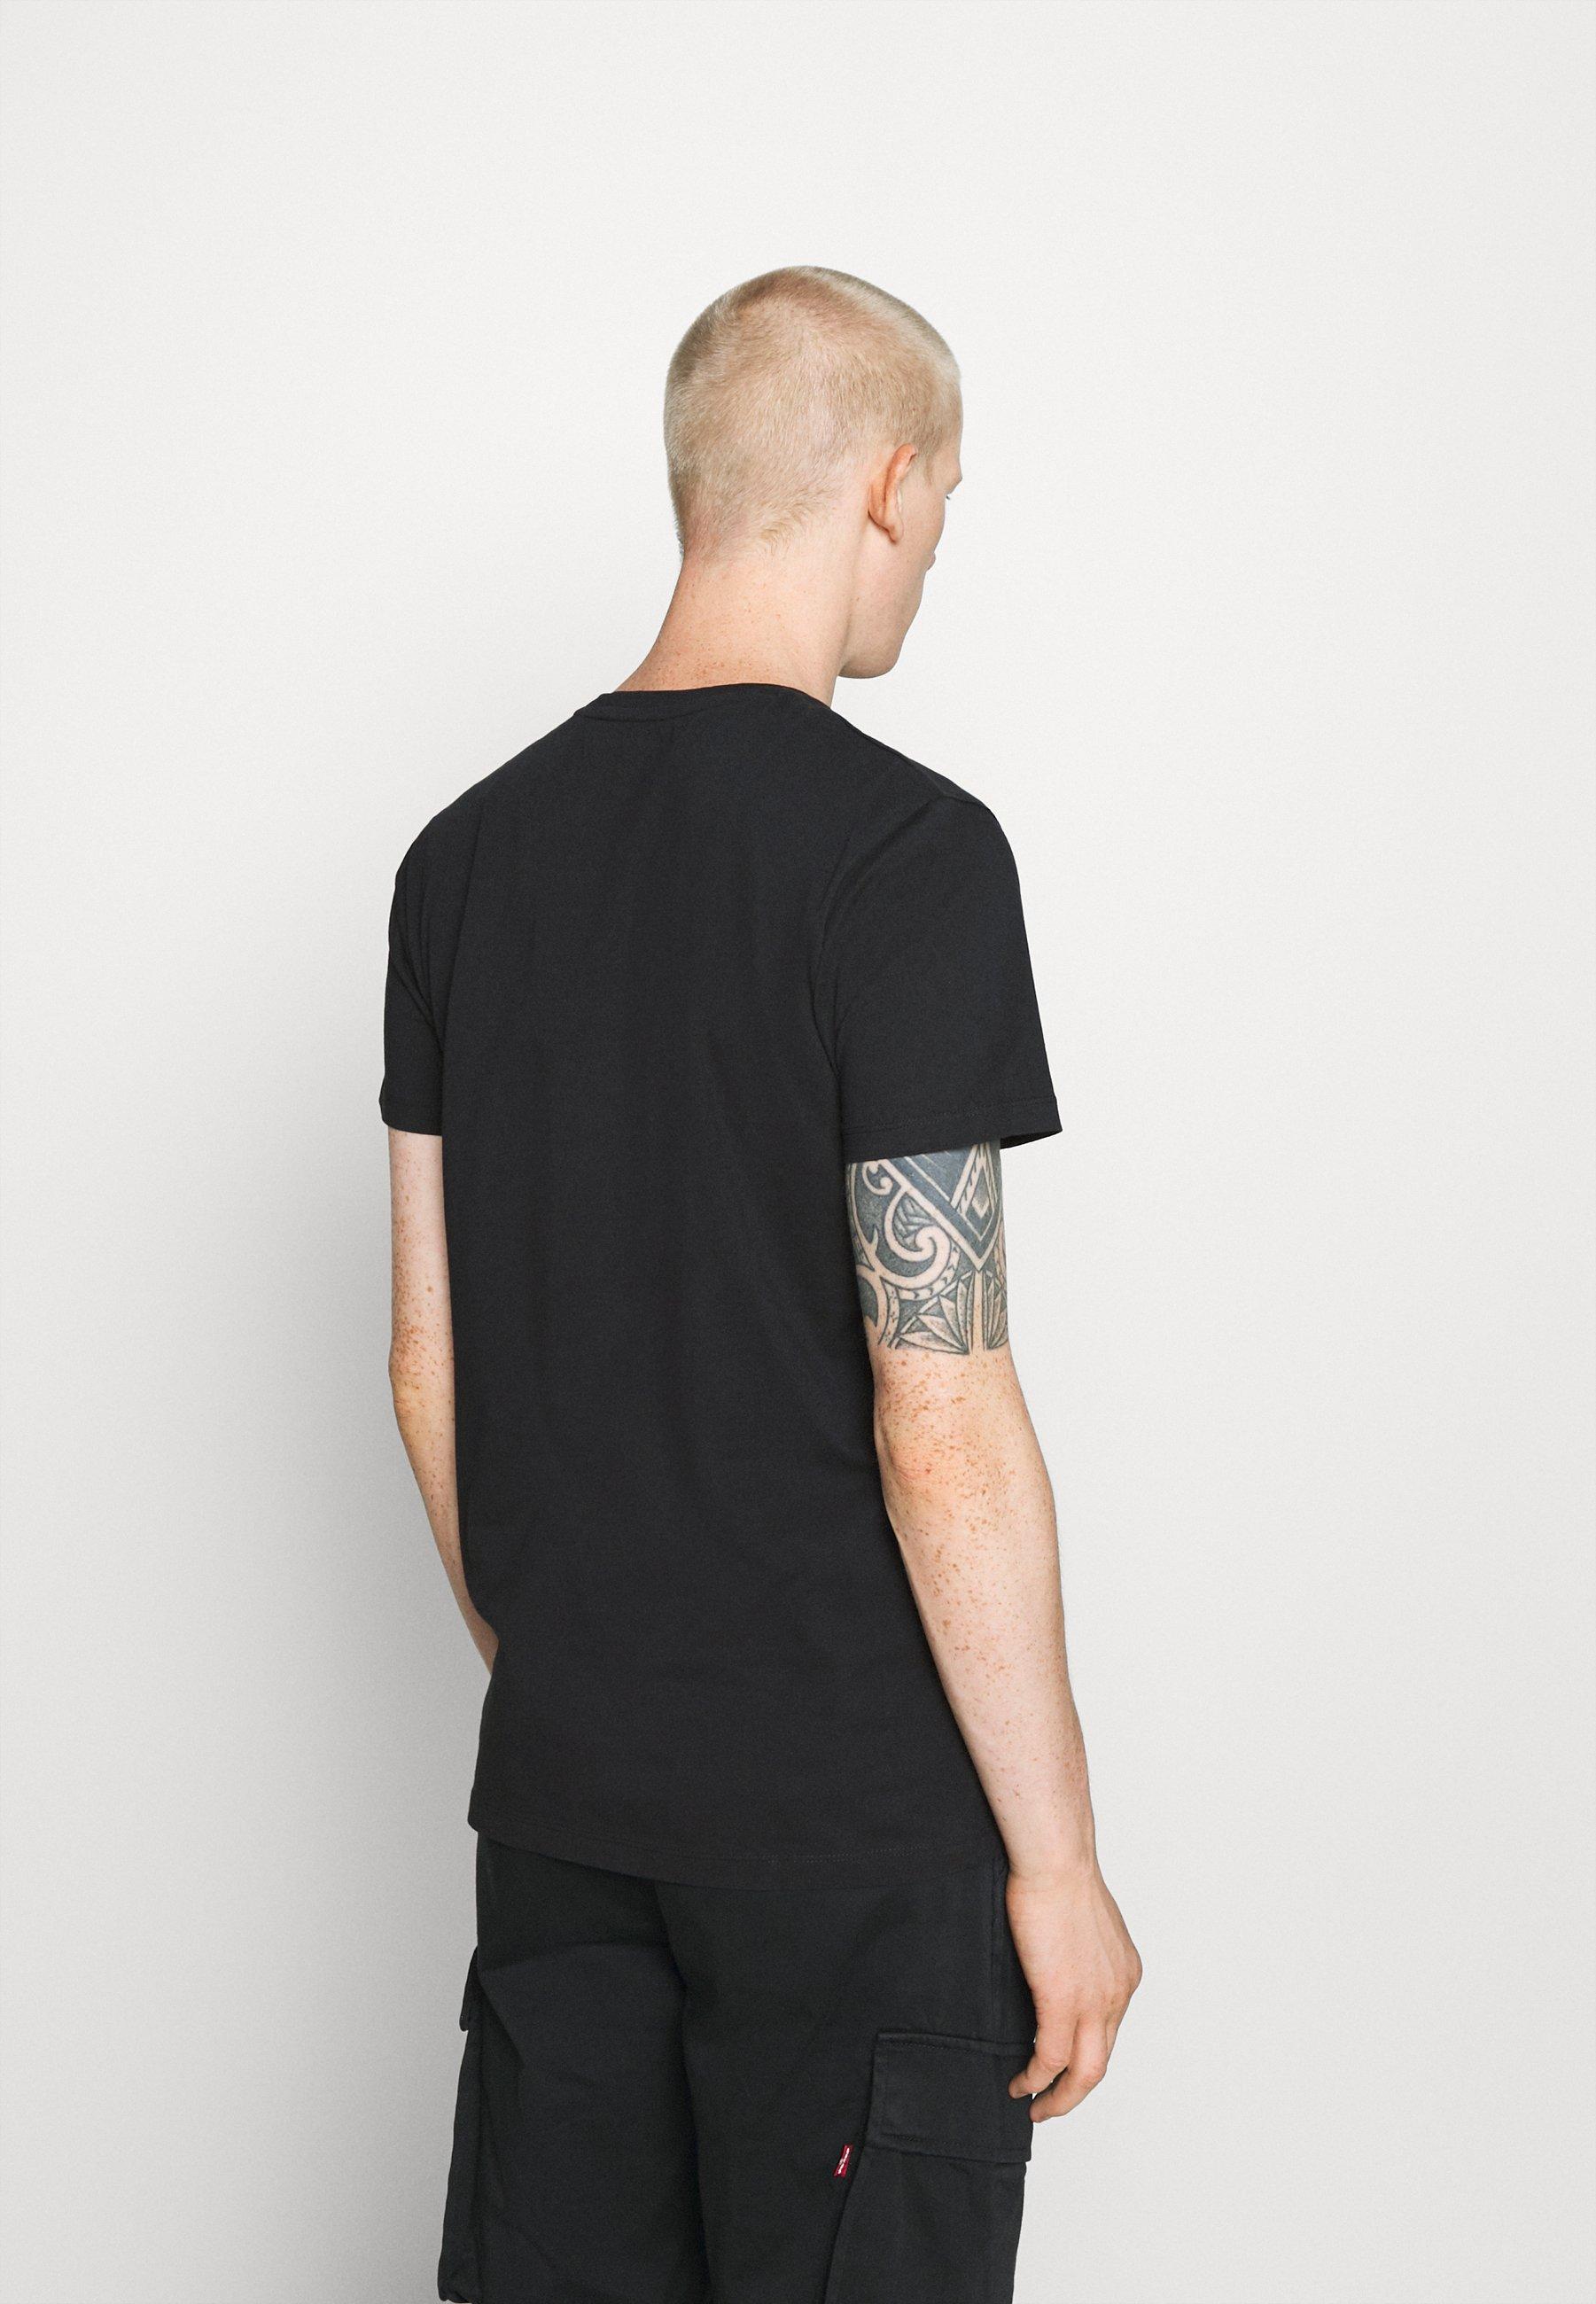 Esprit Print T-shirt - black i8HyB